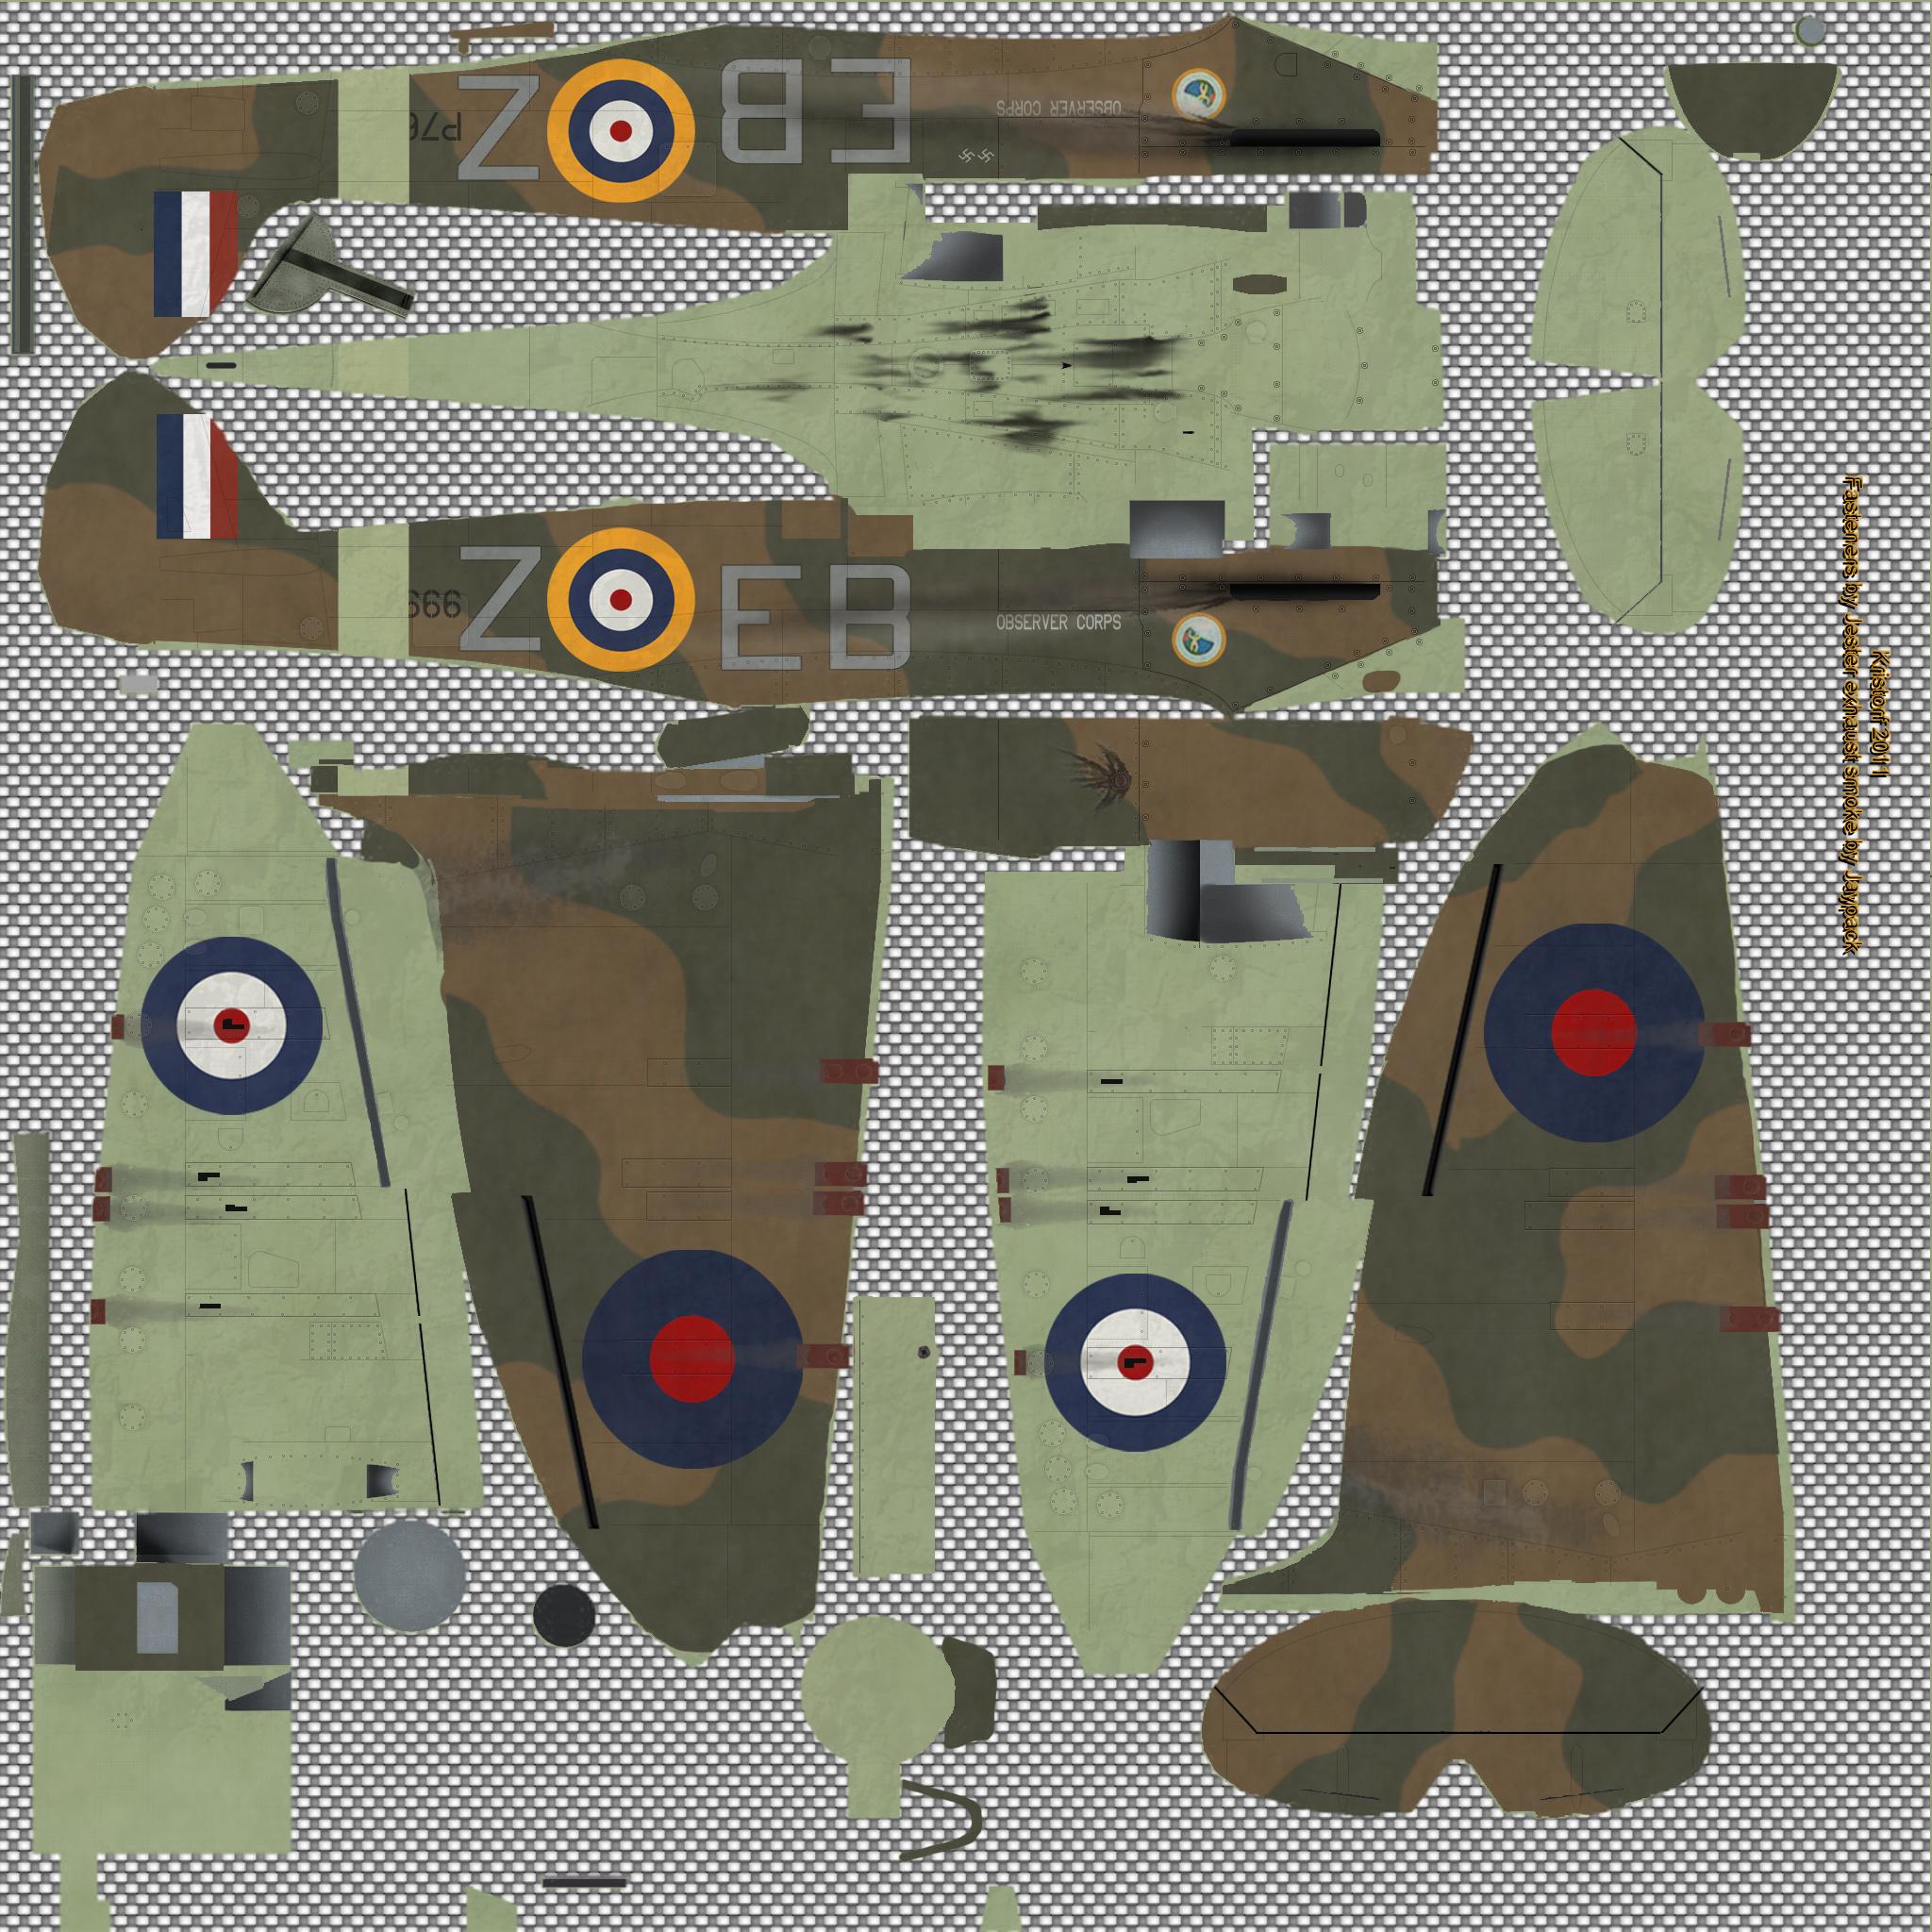 COD KF MkIIa RAF 41Sqn EBZ Jack Stokoe P7666 England 1941